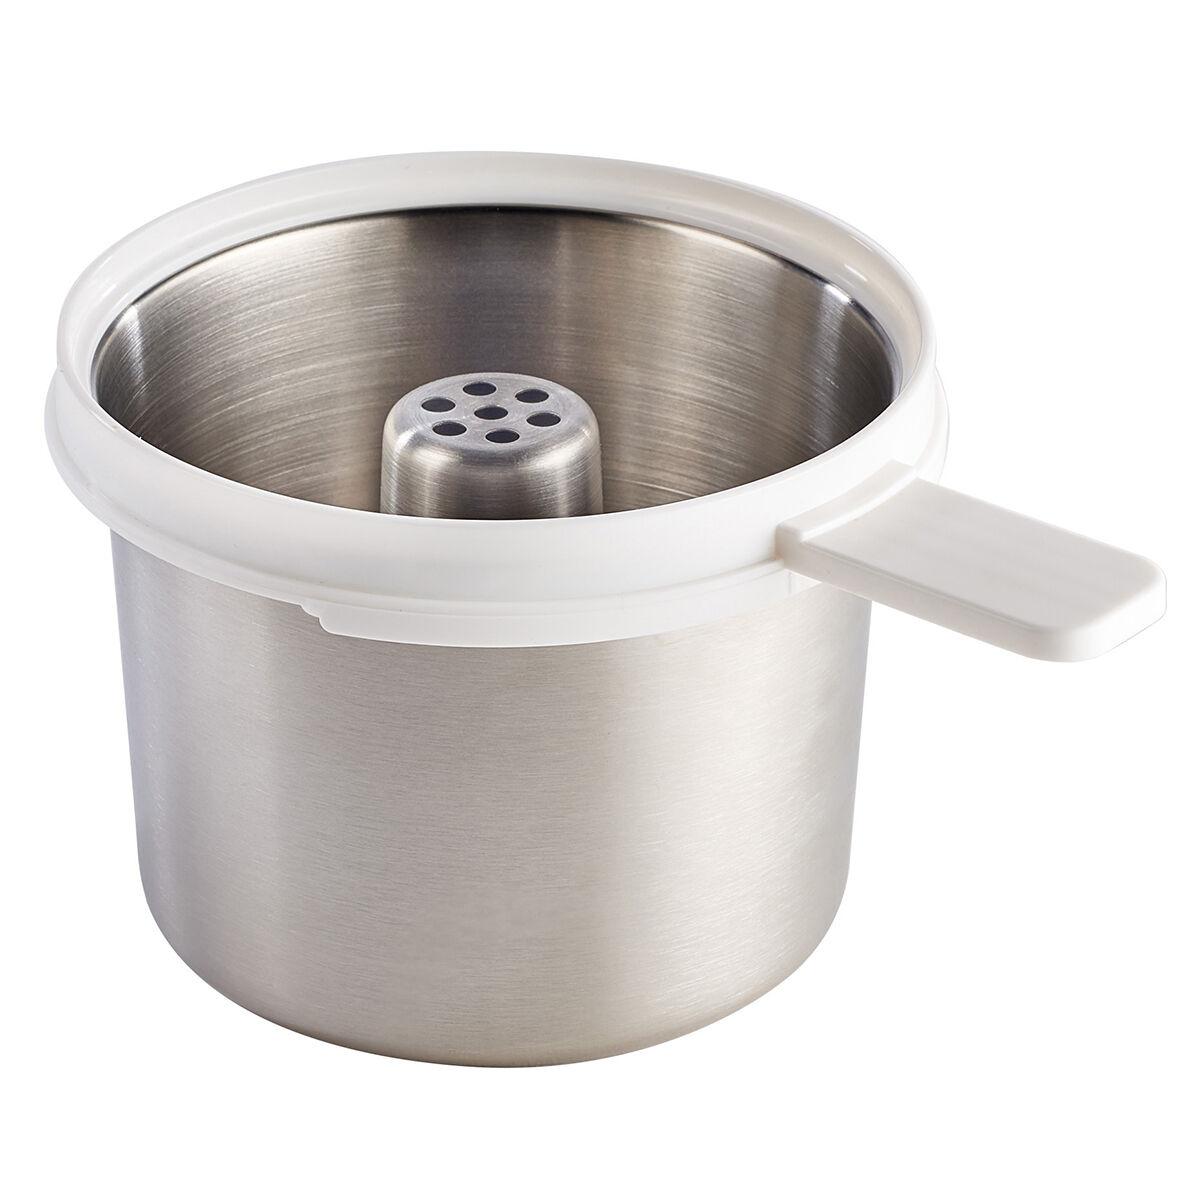 BÉABA Pasta-Rice Cooker Babycook Neo - Inox